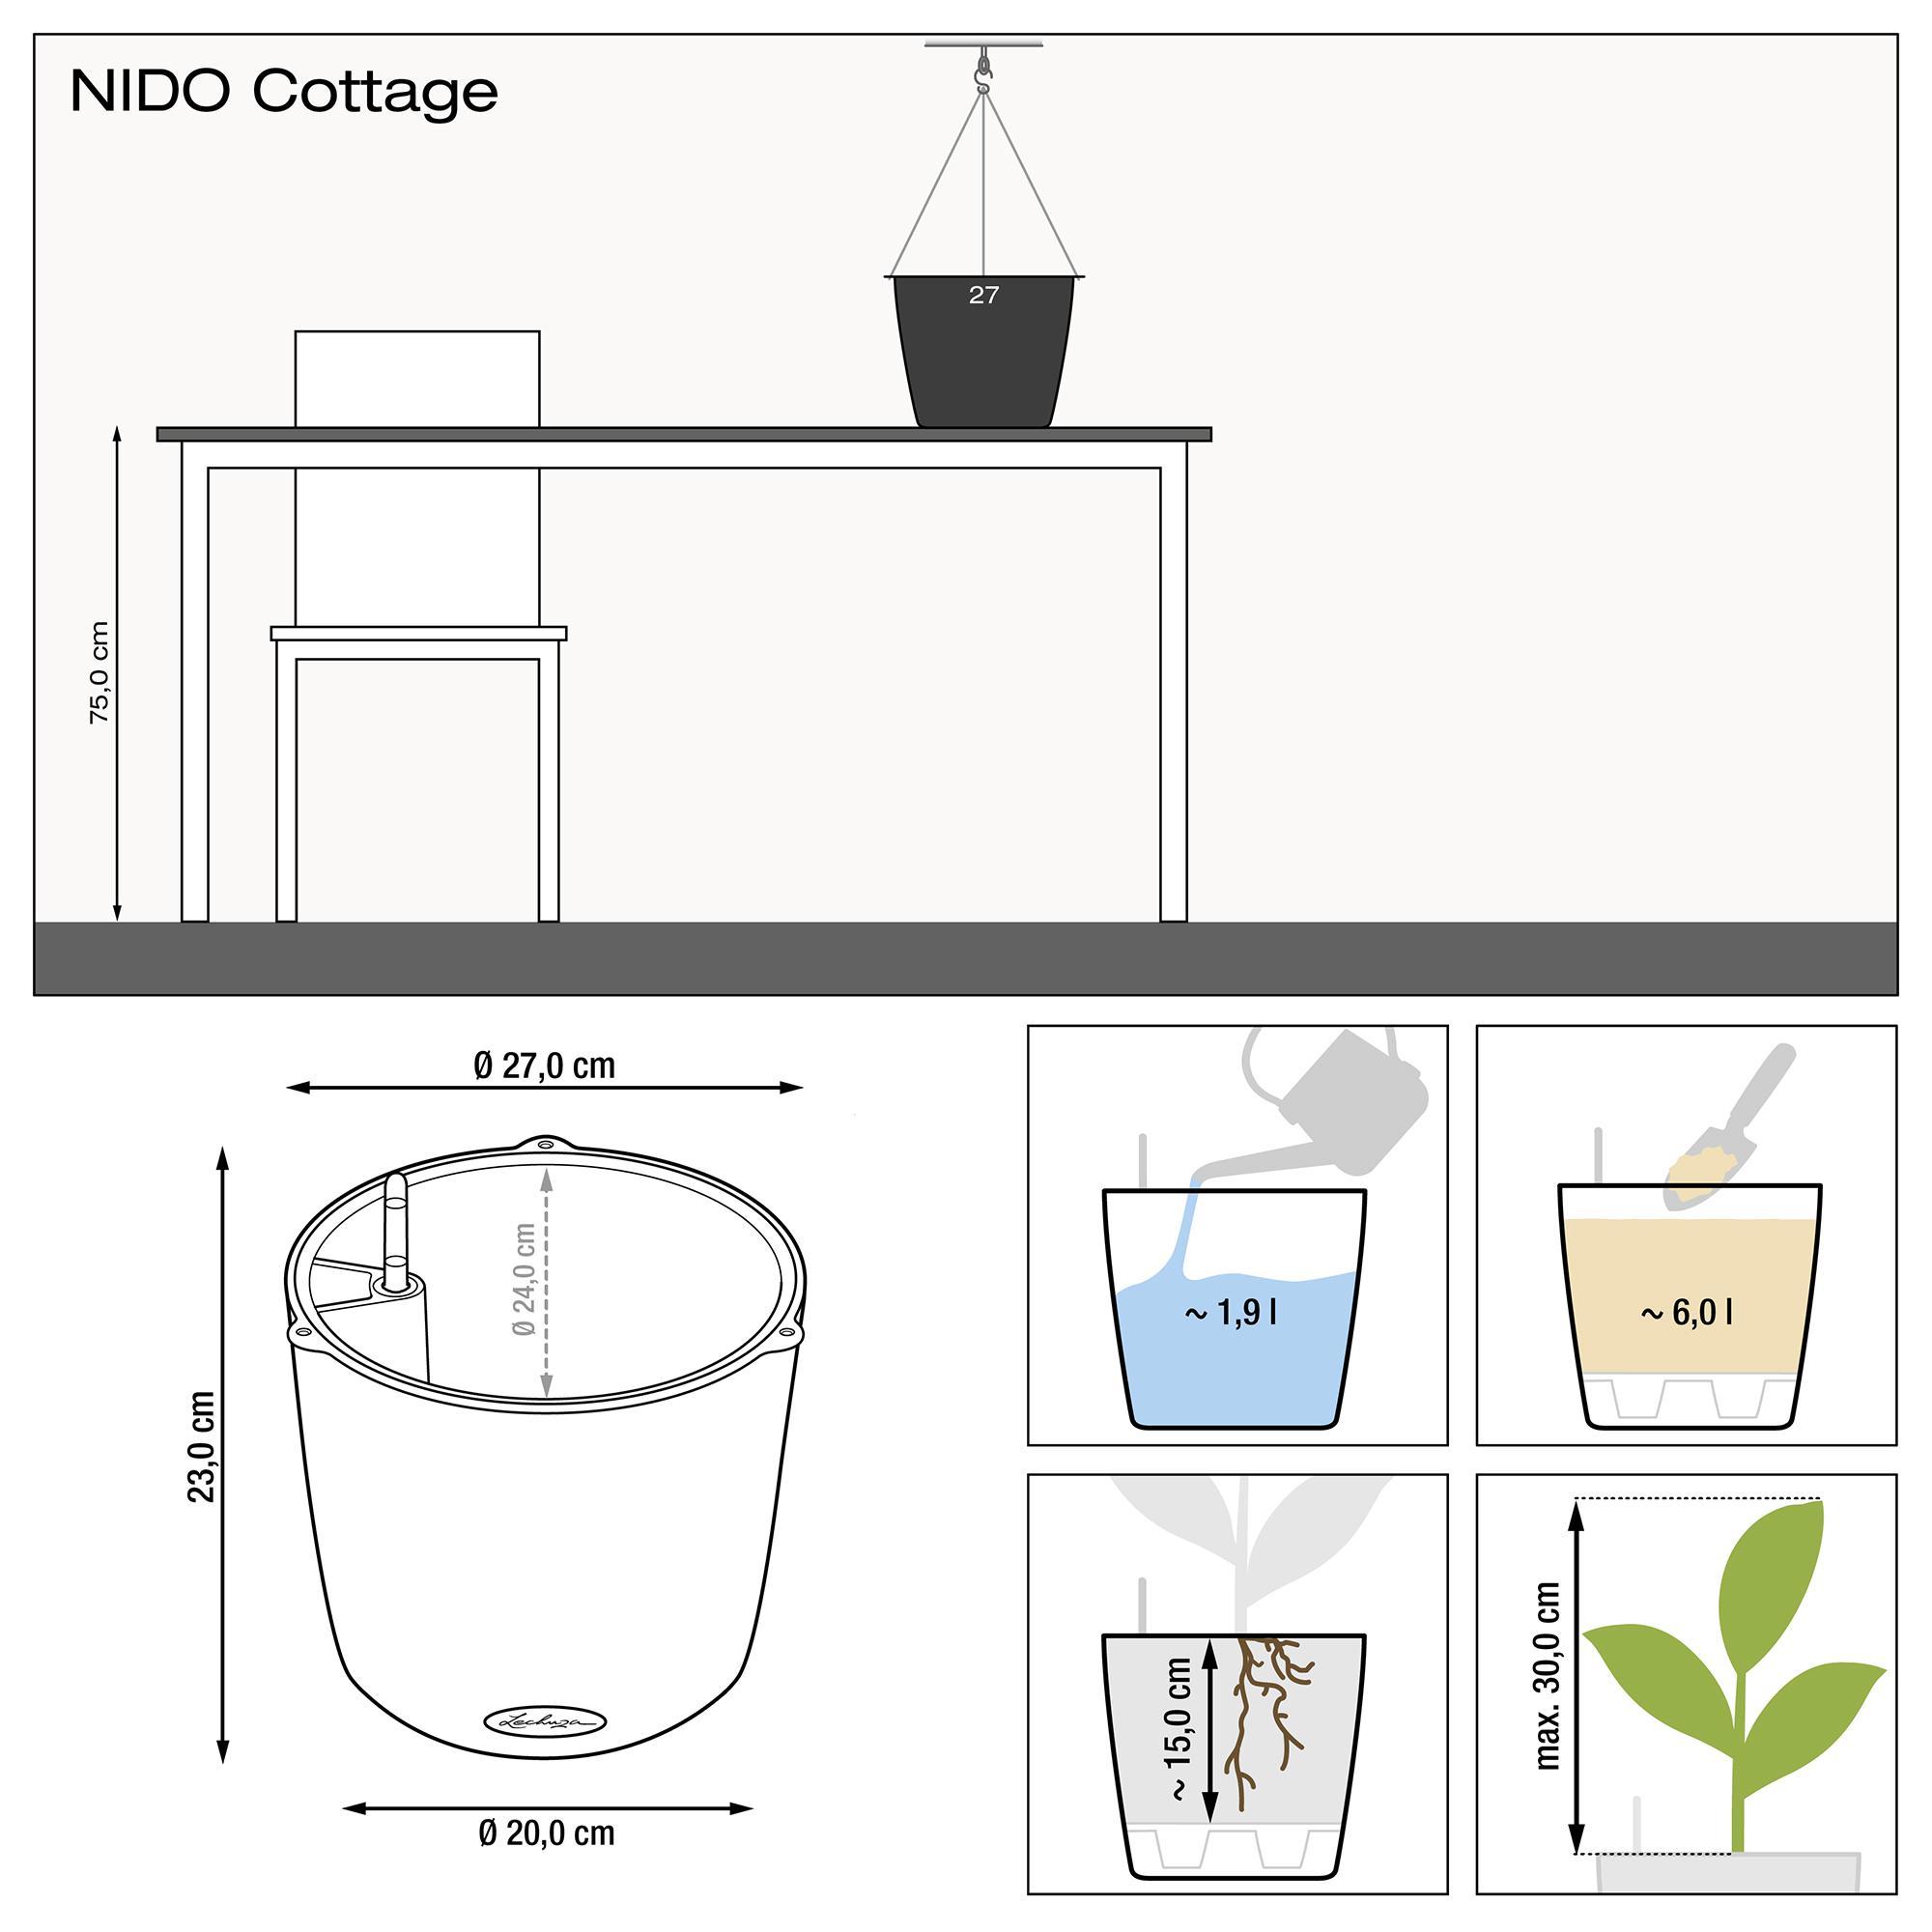 le_nido-cottage_product_addi_nz